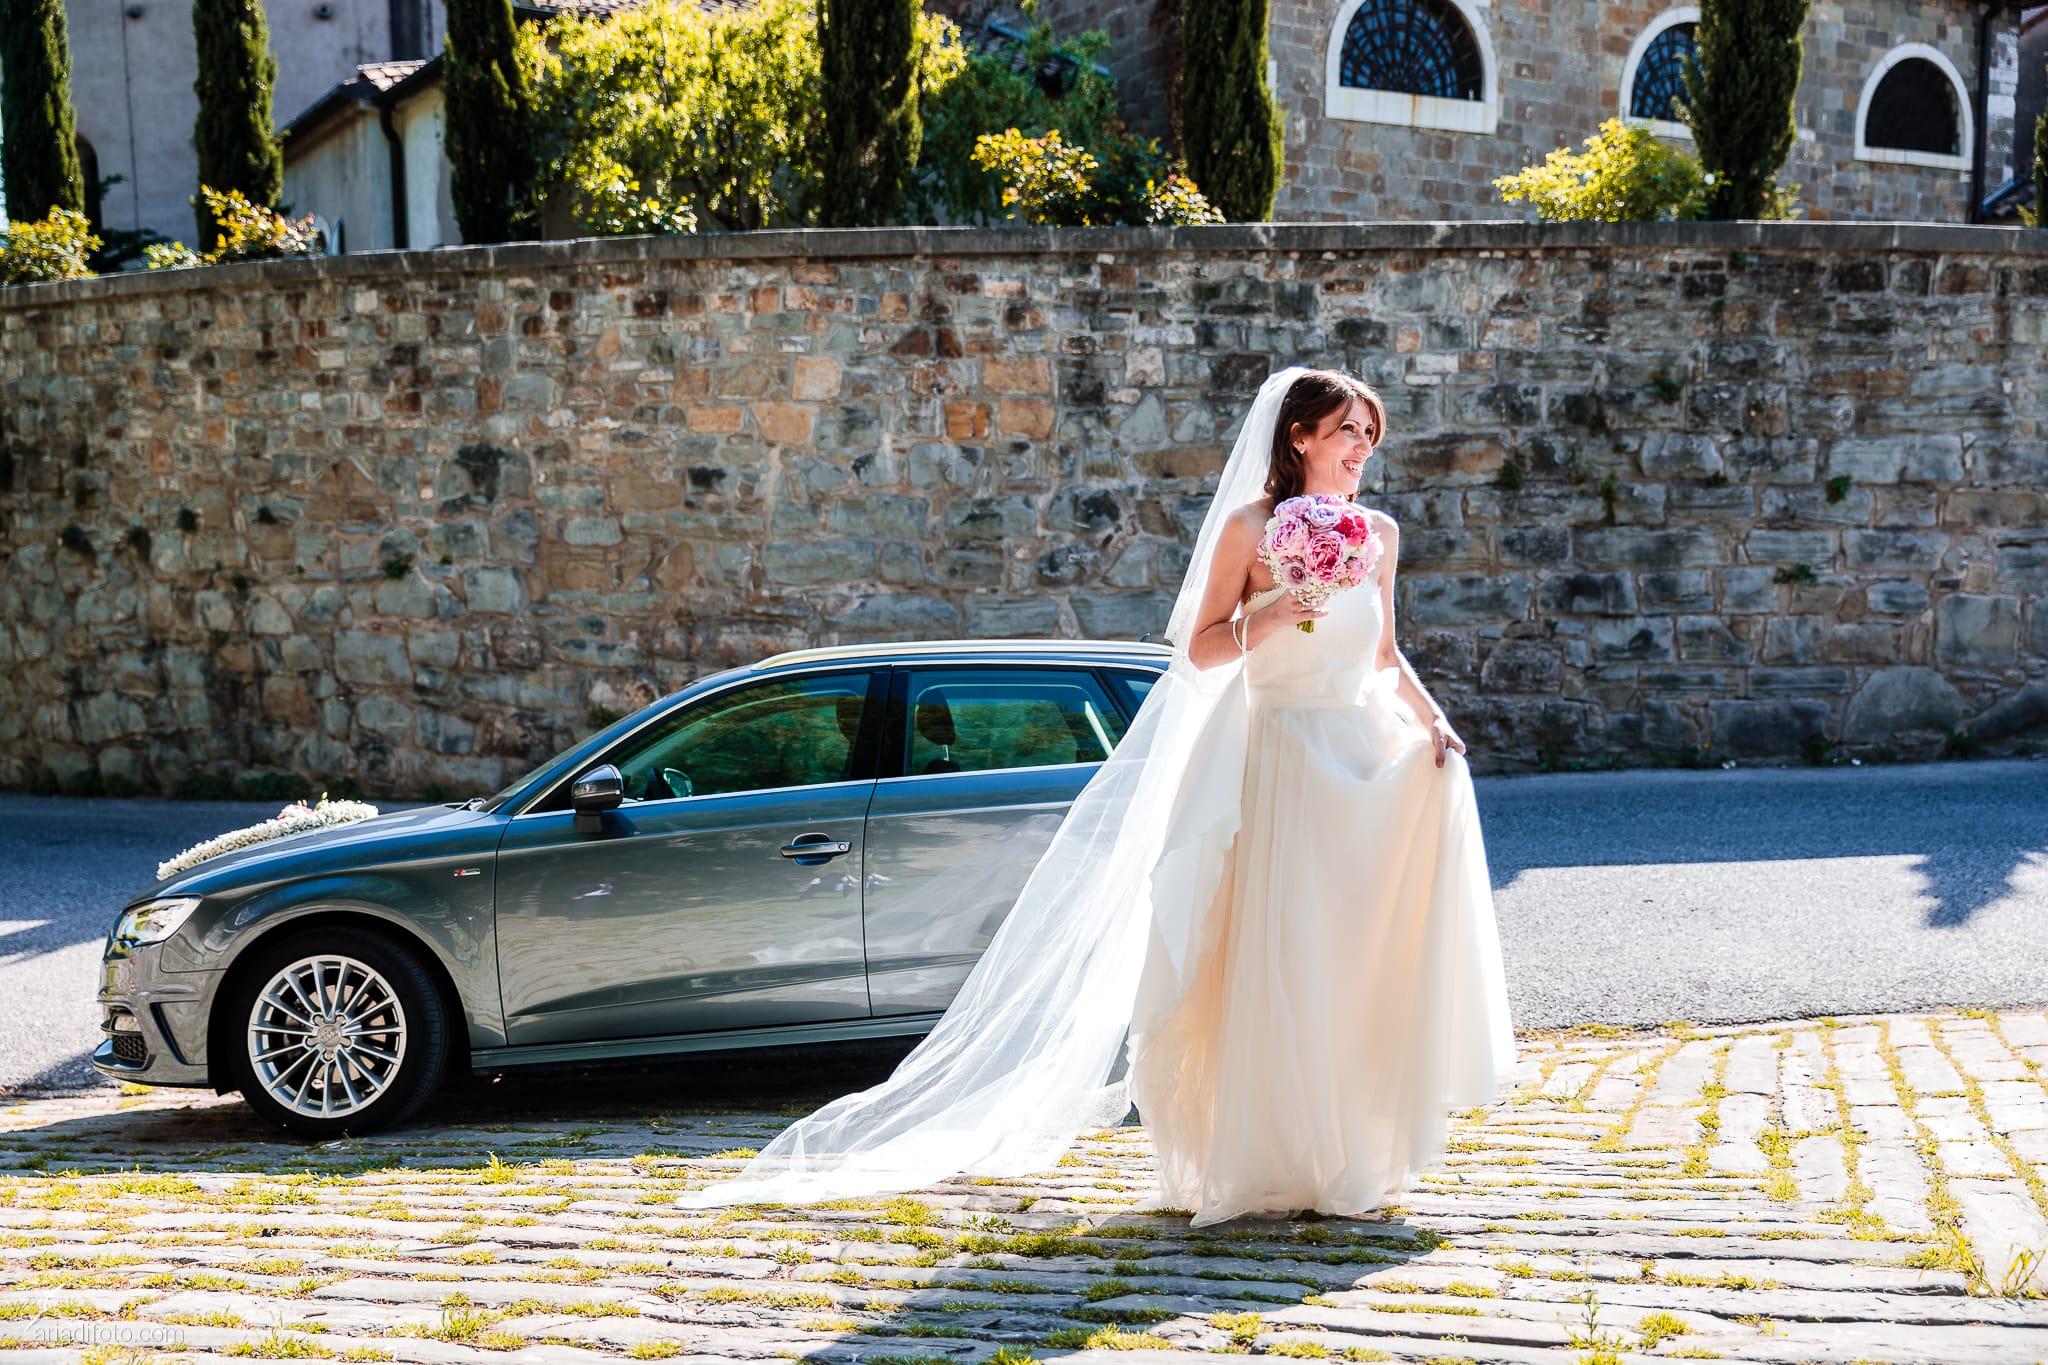 Marina Stefano Matrimonio Castello San Giusto Molo IV Trieste cerimonia civile ingresso sposa